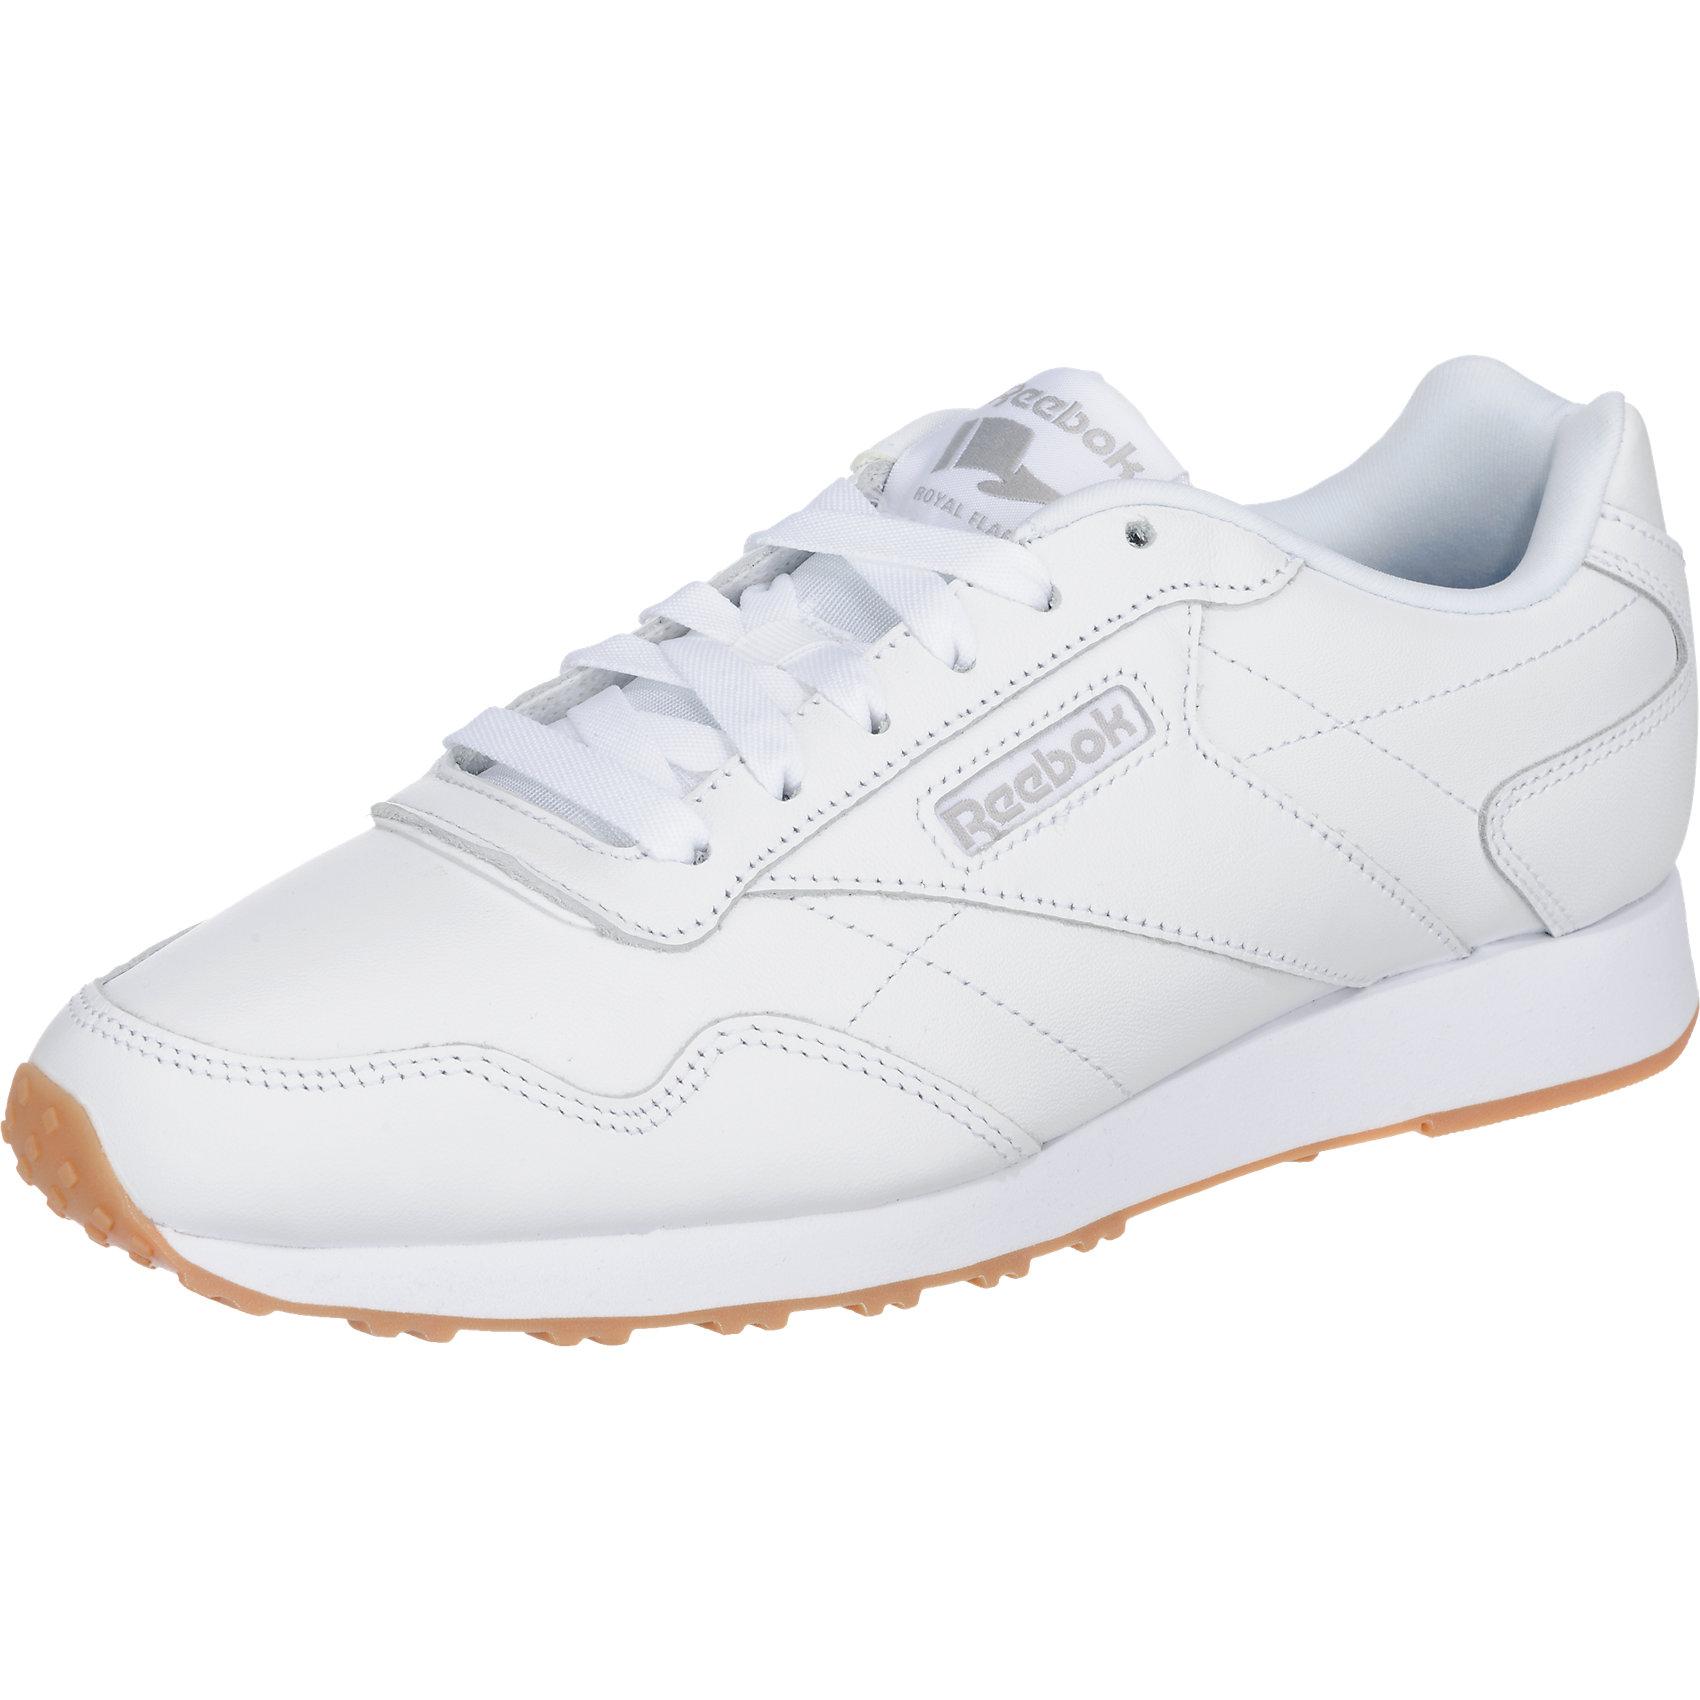 competitive price 79393 9365a ... Nike Men s Air Python Prm Basketball Shoe Shoe Shoe 93b1d3 ...